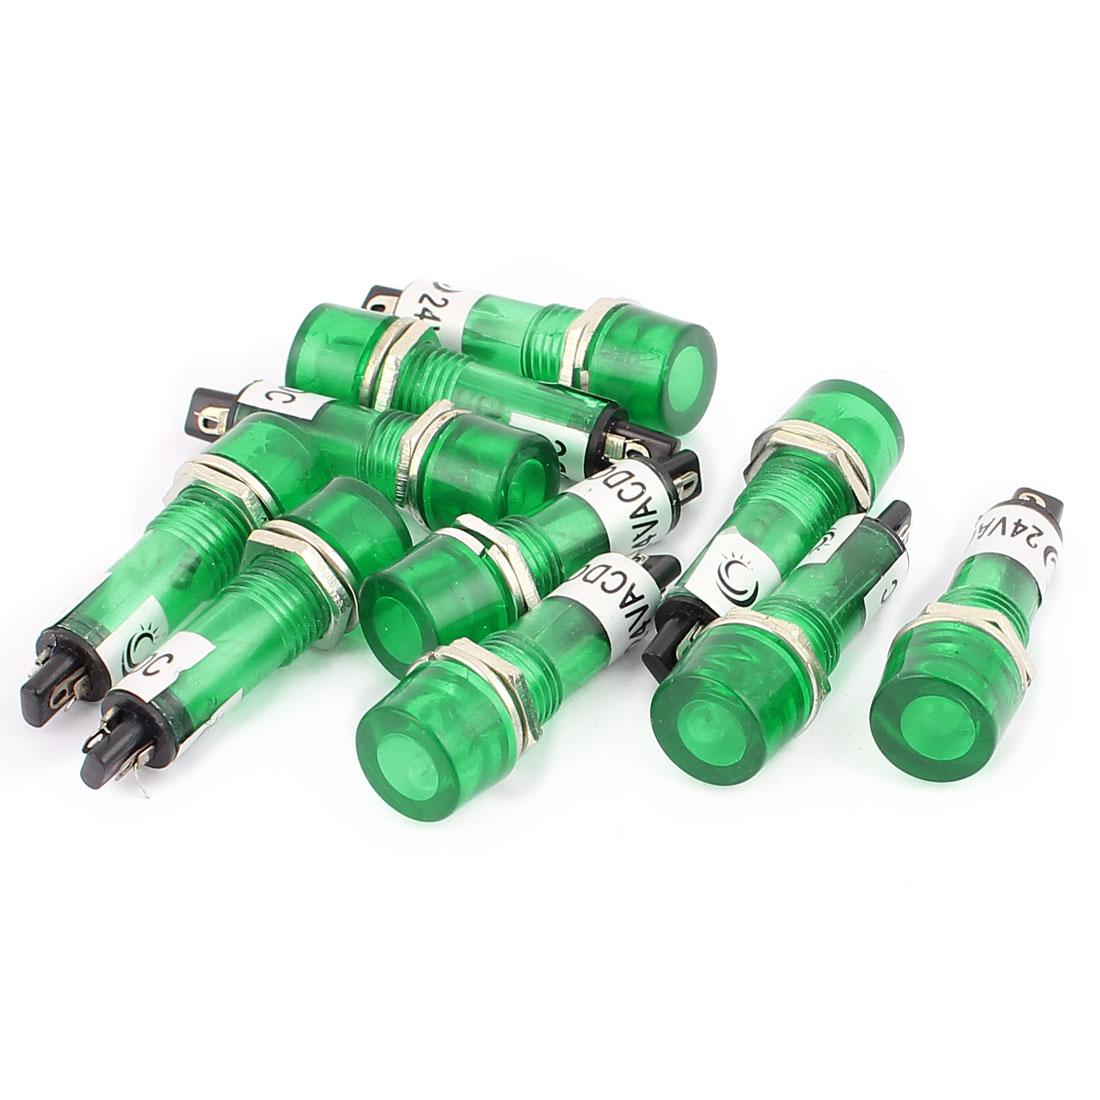 10 Pcs AC/DC 24V 2 Terminals Green Light Signal Threaded Indicator Lamp